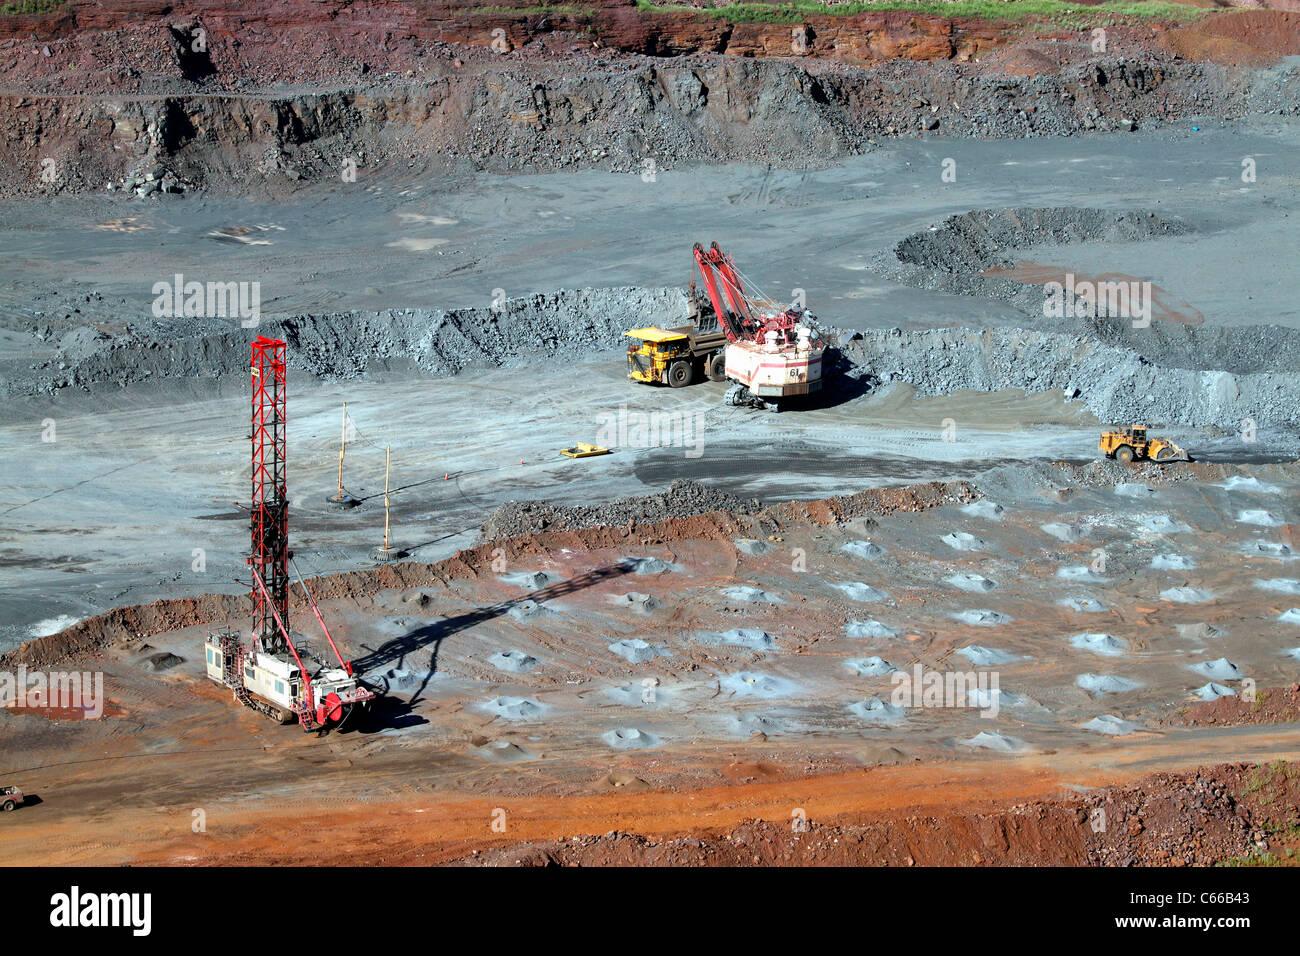 Hull Rust – Mahoning Open Pit Iron Mine, Haul and blast pattern operations - Stock Image